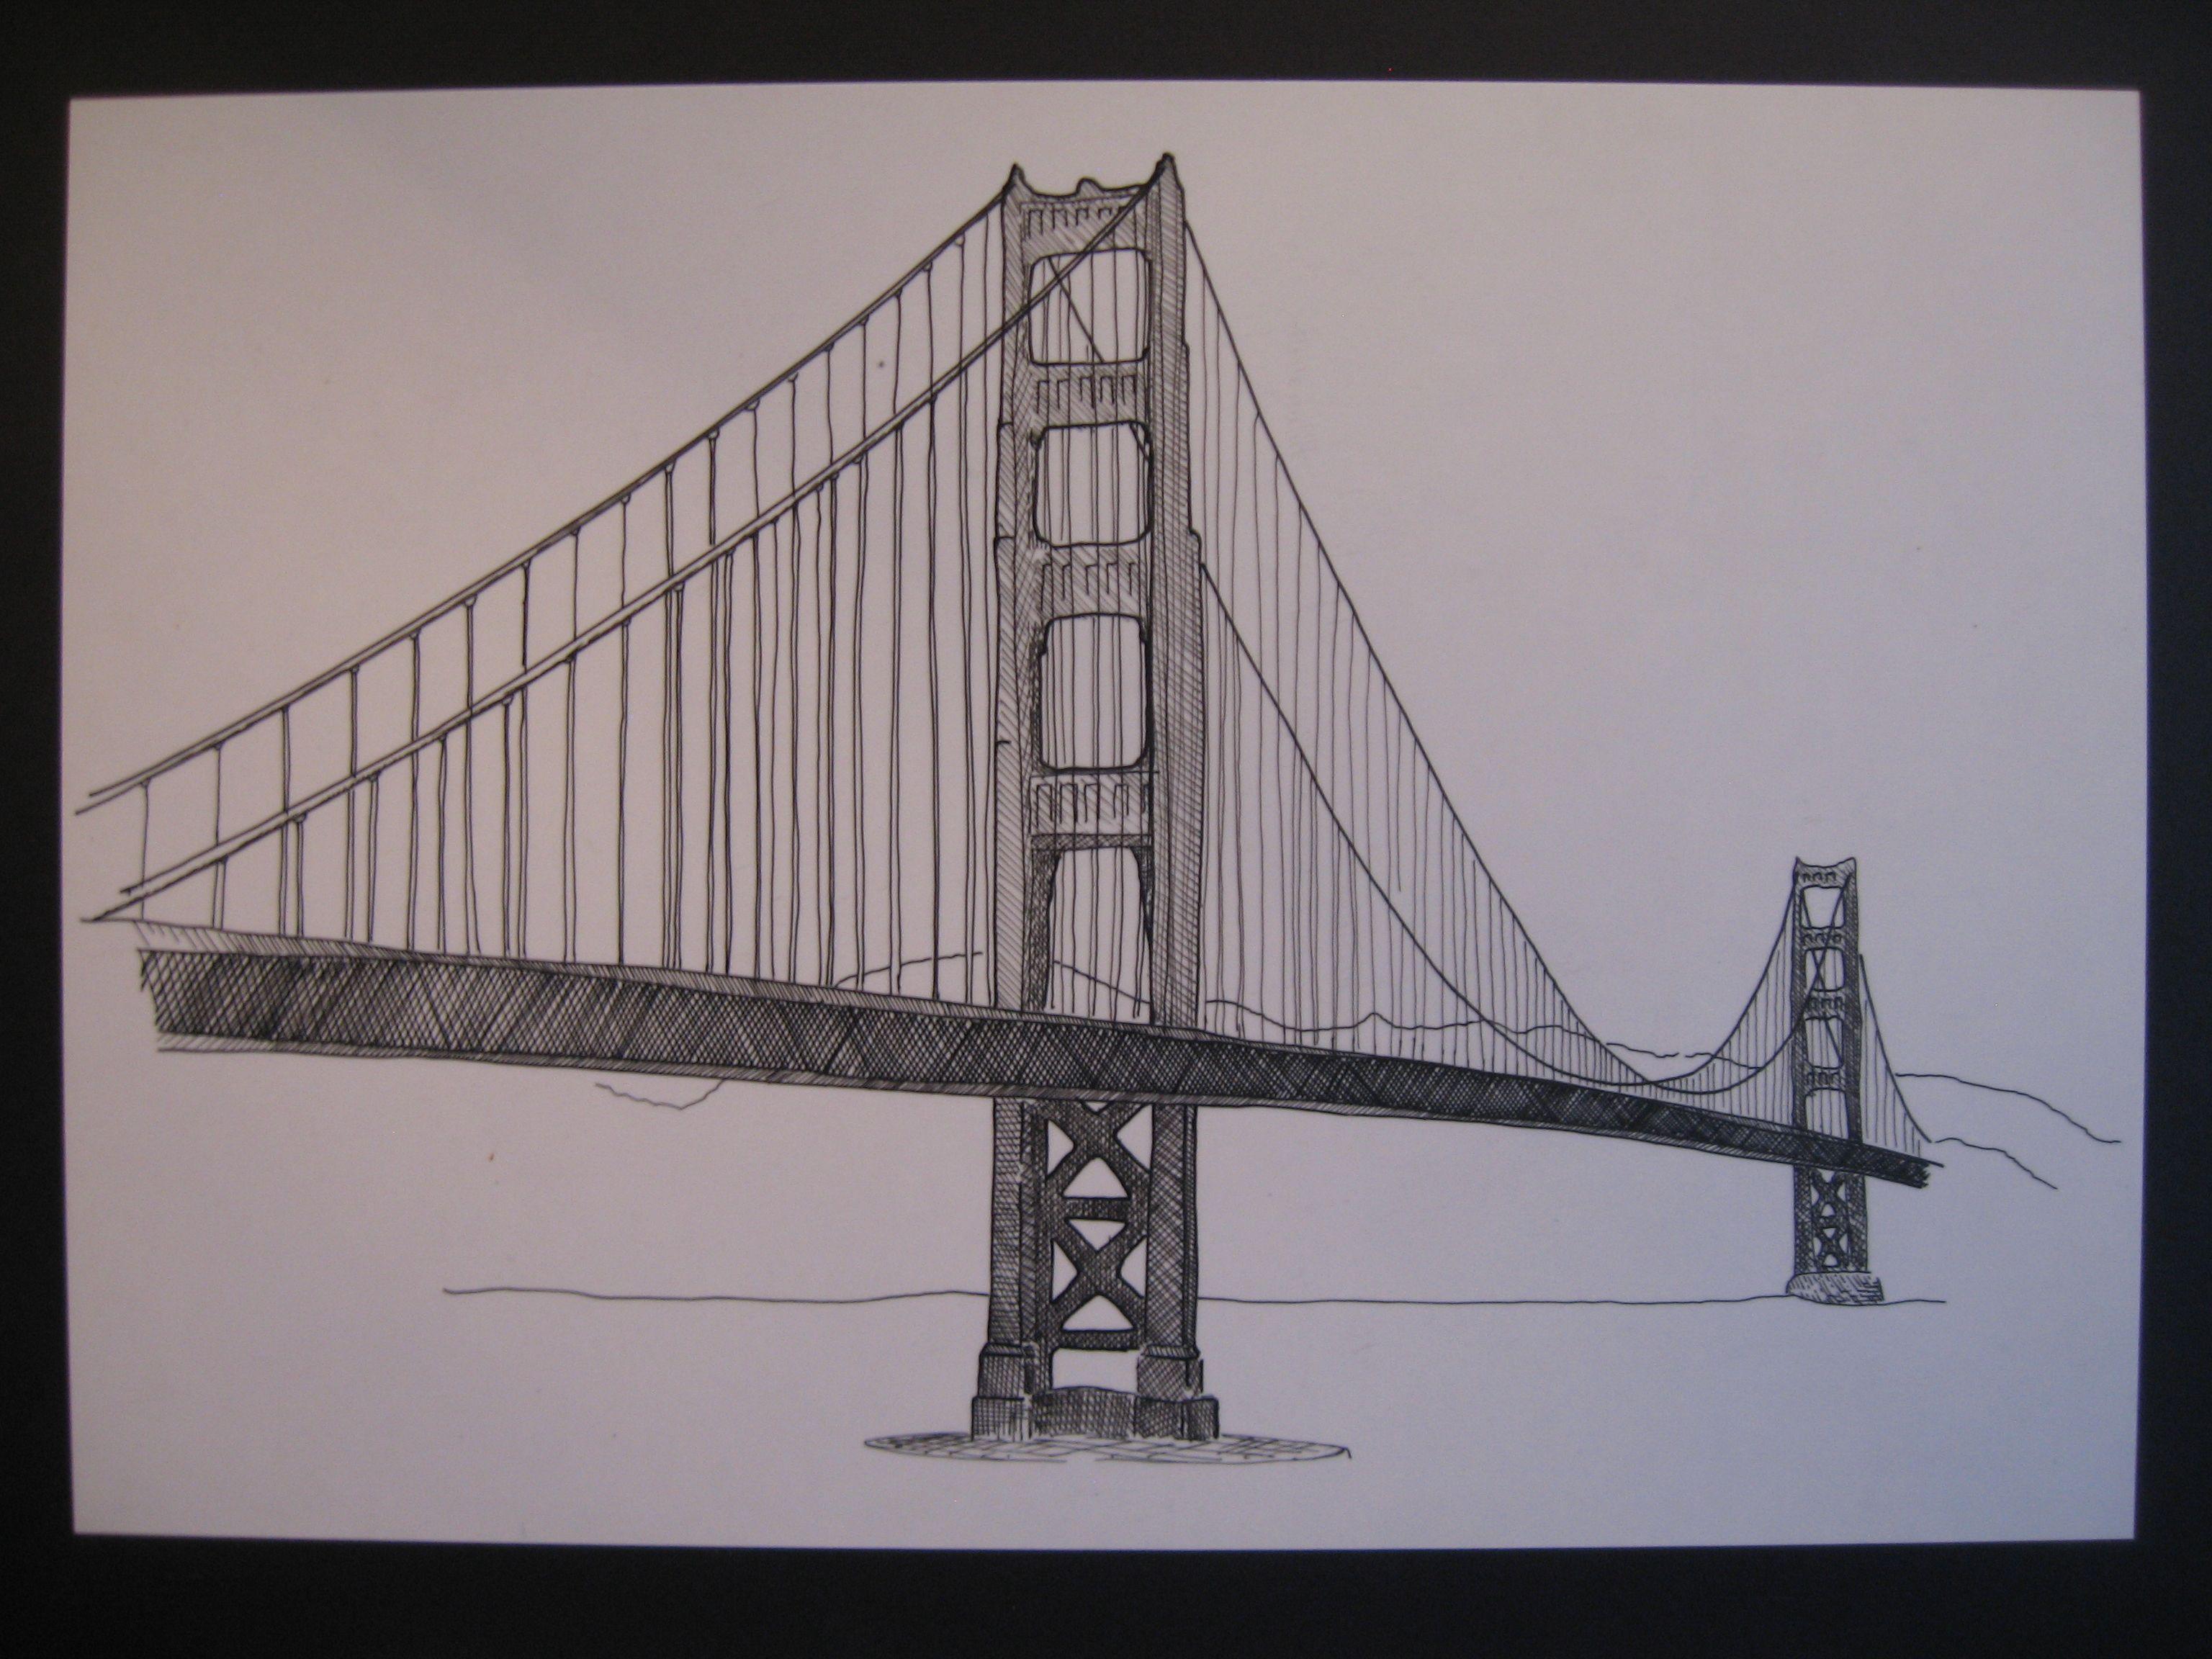 3072x2304 Gate Bridge Drawing